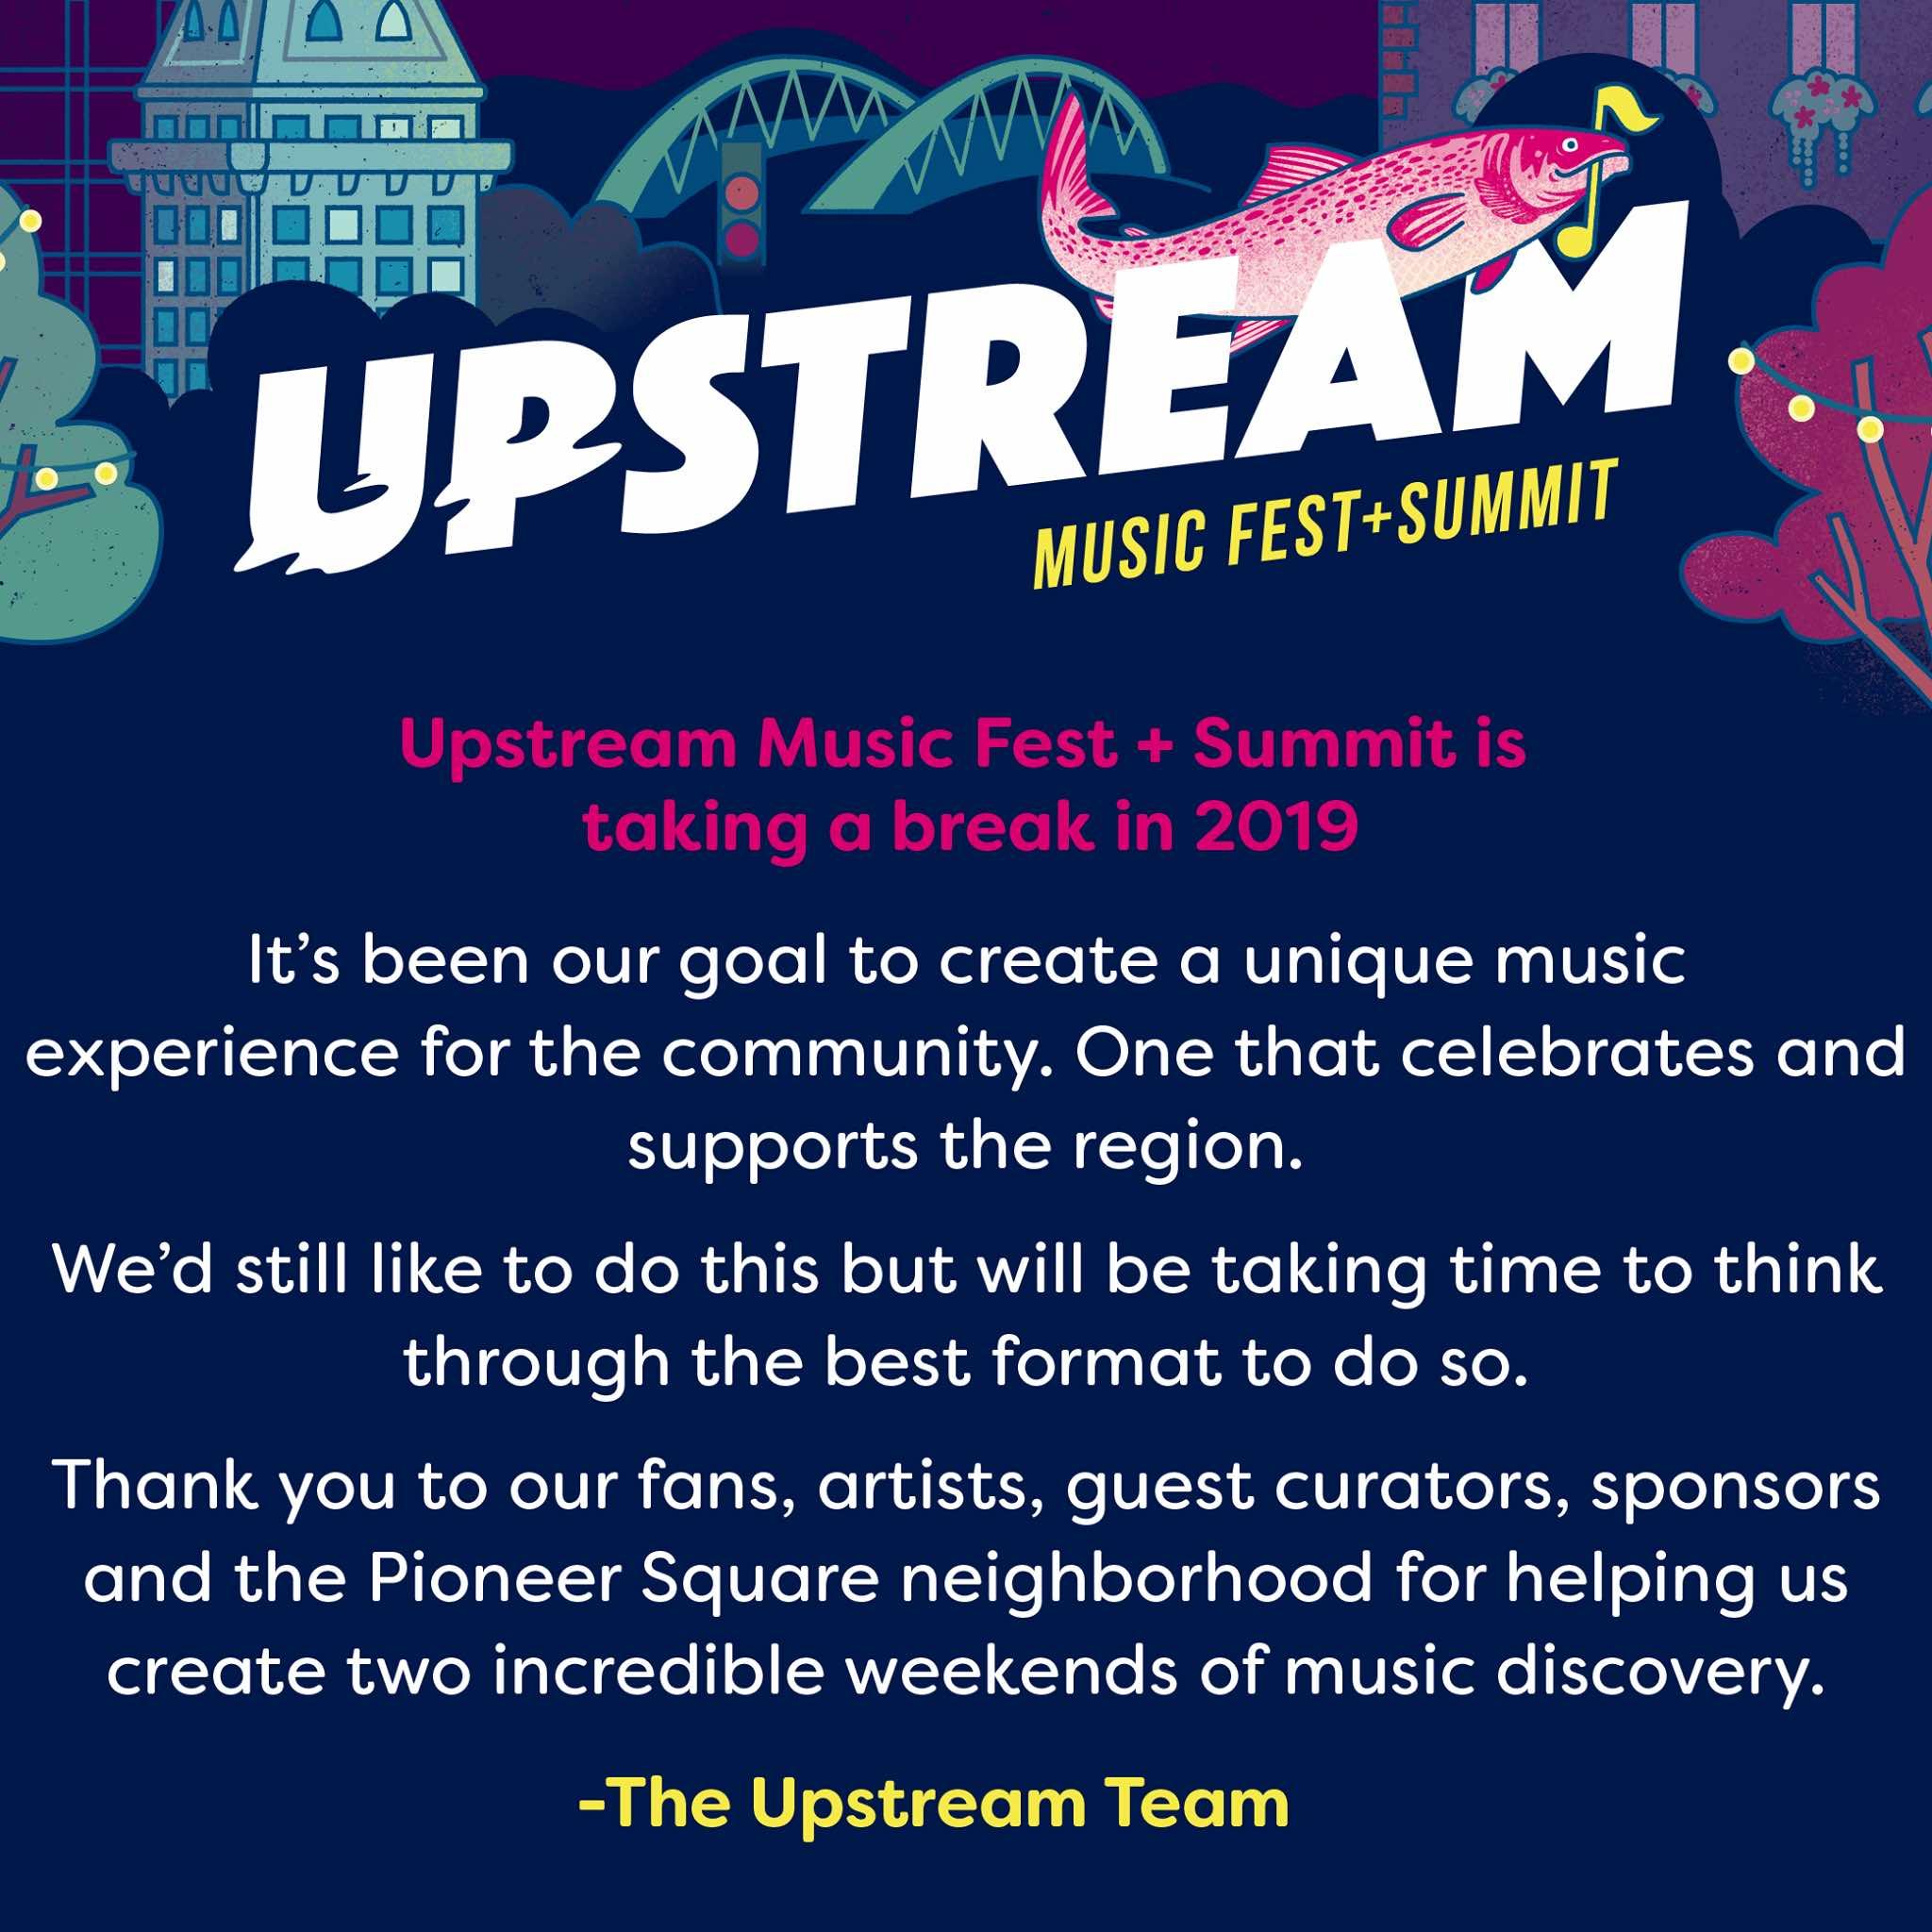 Upstream Music Festival Sumit - Best Washington Festivals 2020